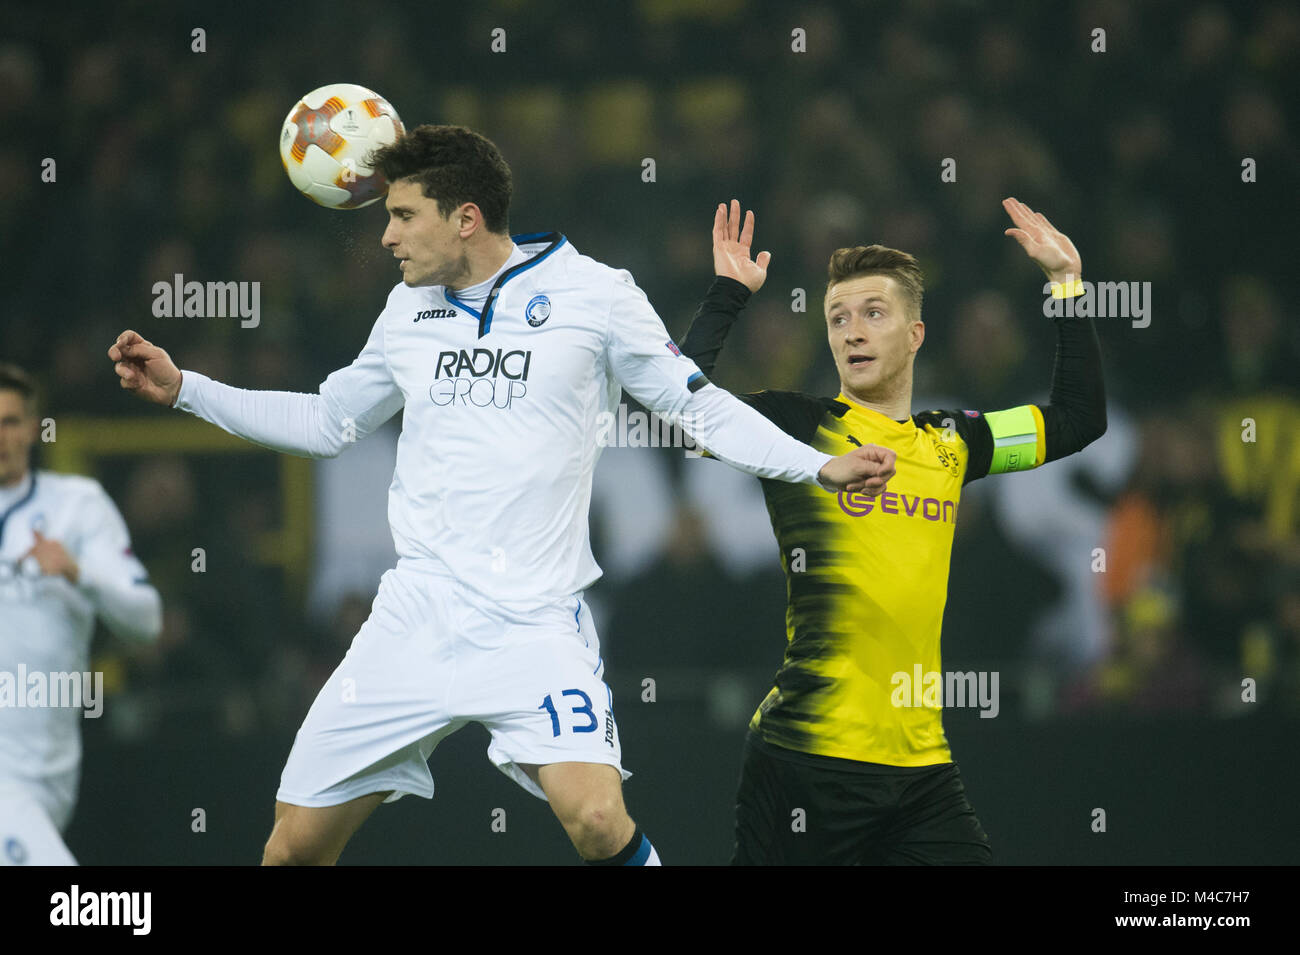 Dortmund, Germany. 15th Feb, 2018. Dortmund's Marco Reus (R) and Bergamo's Mattia Caldara vie for the ball - Stock Image